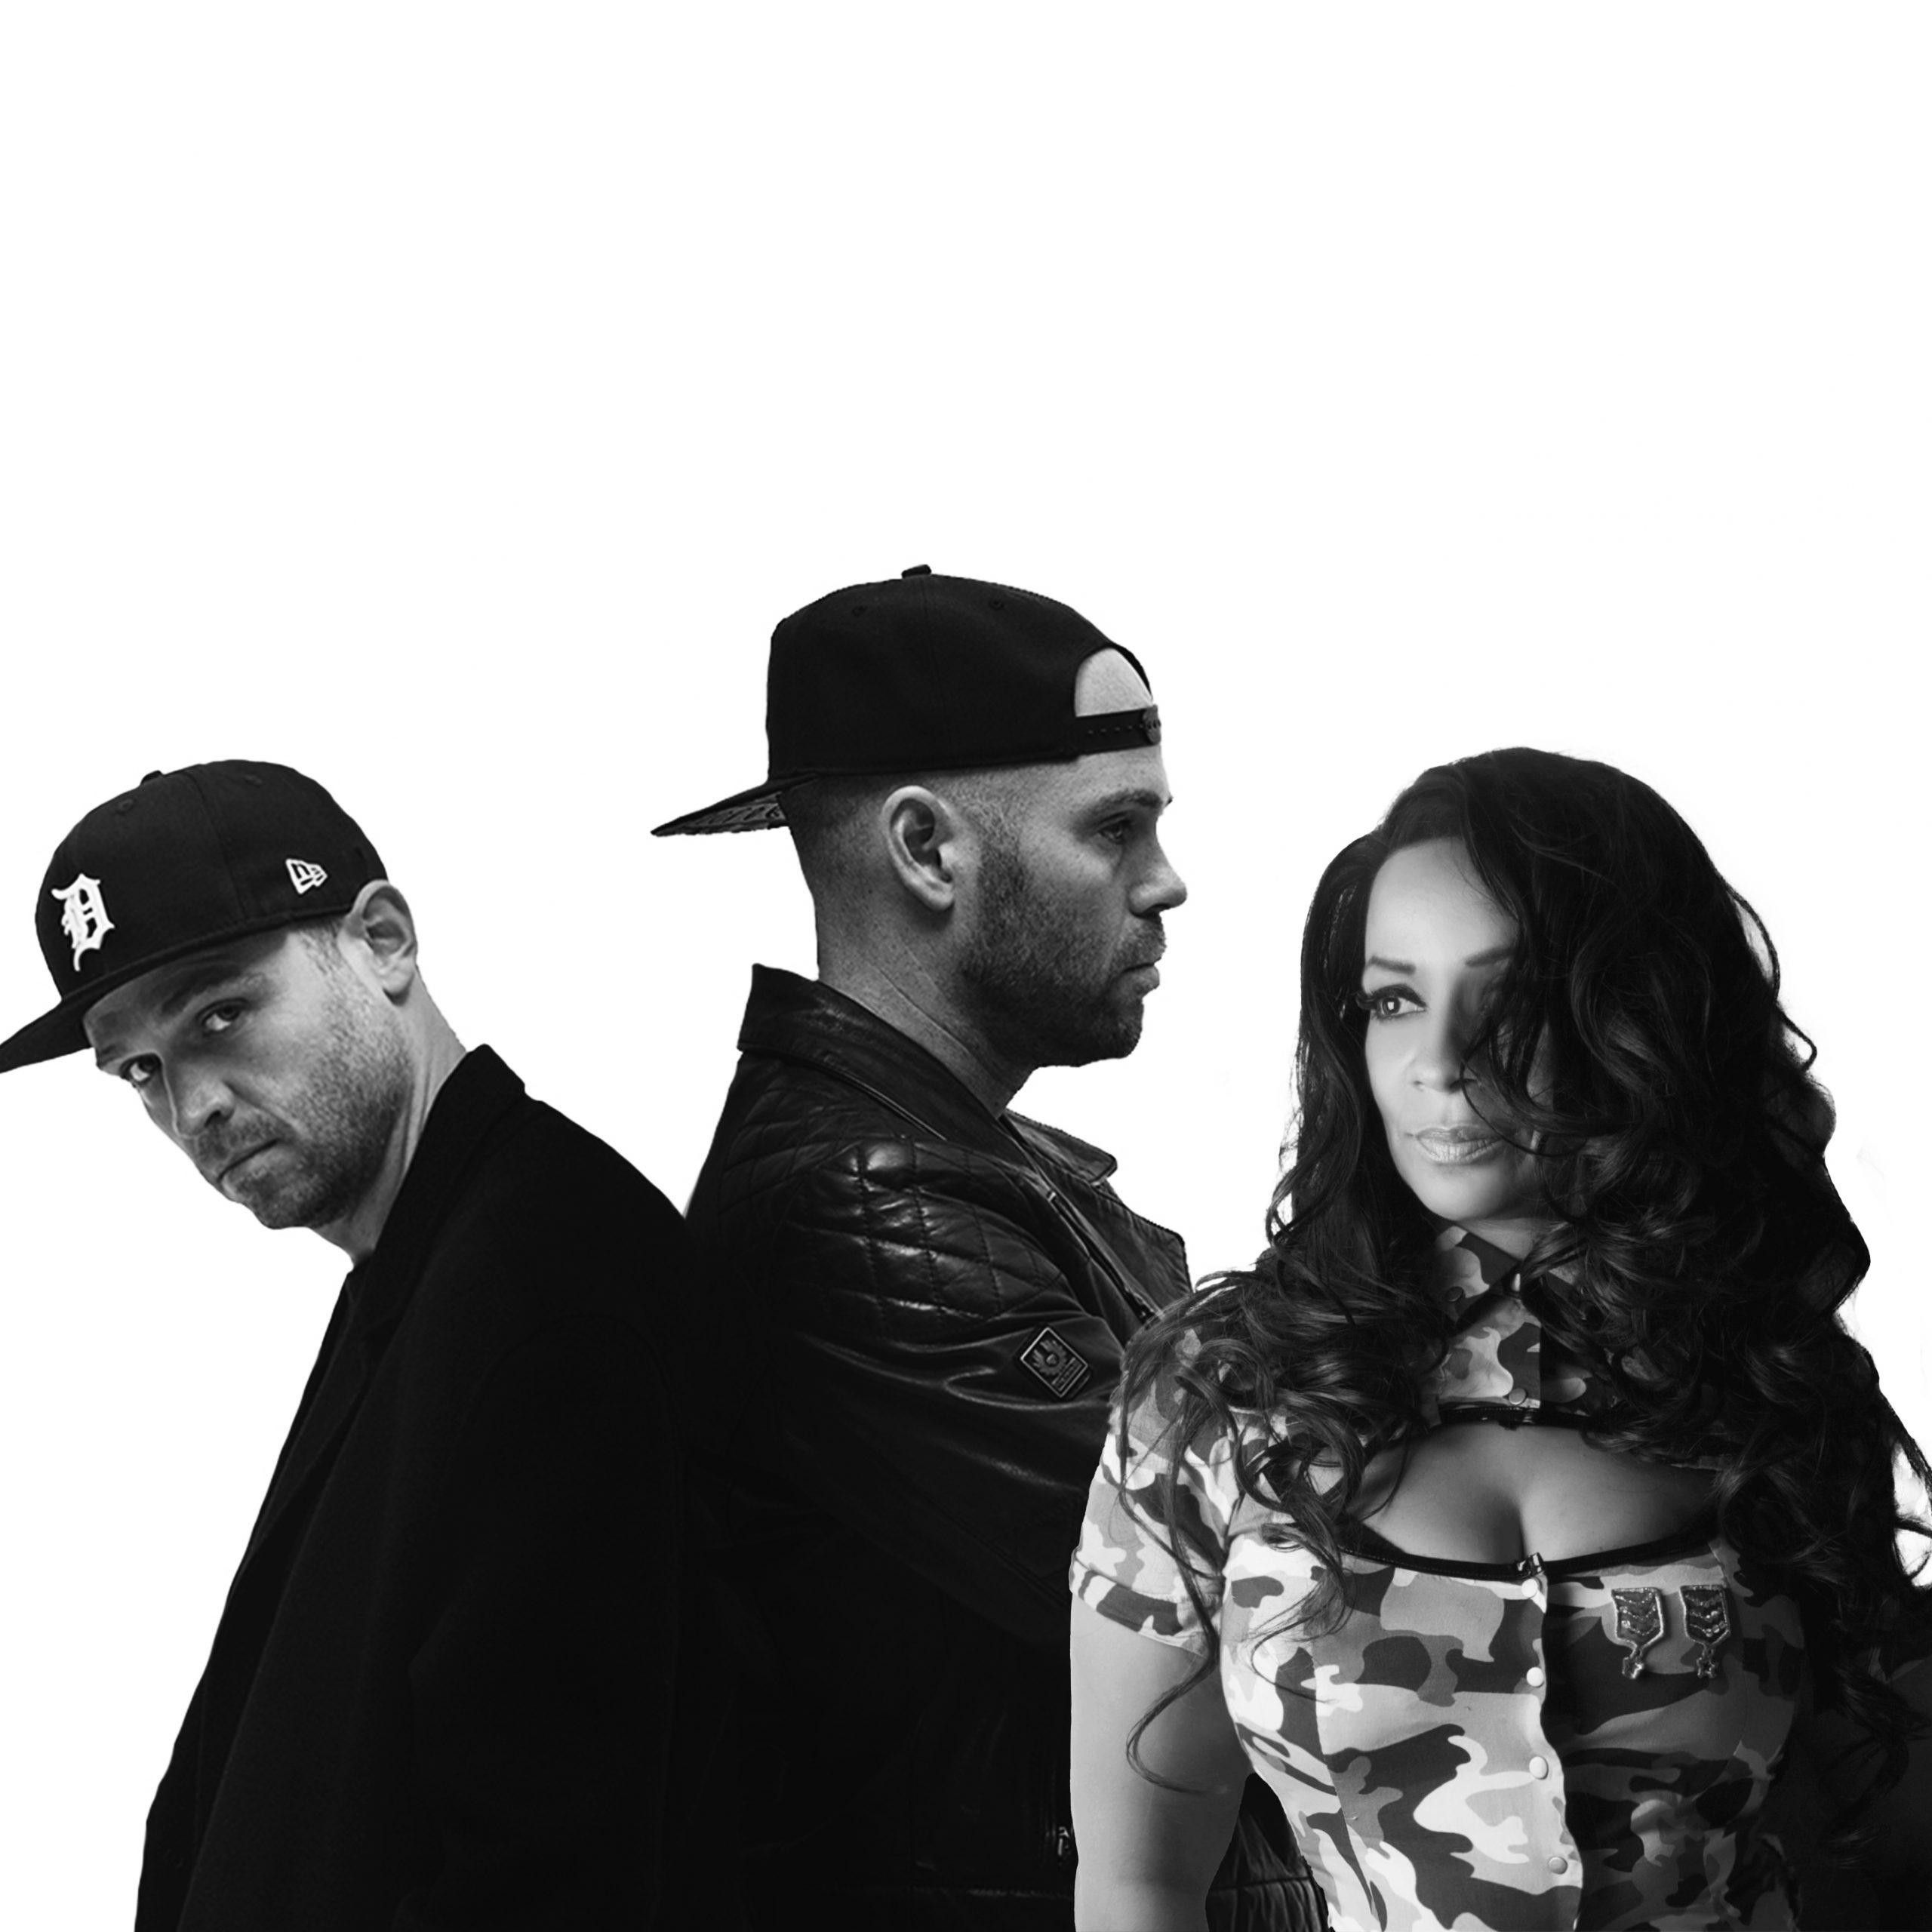 Solardo drop nostalgia-tinged new single 'Enough' – Music is 4 Lovers